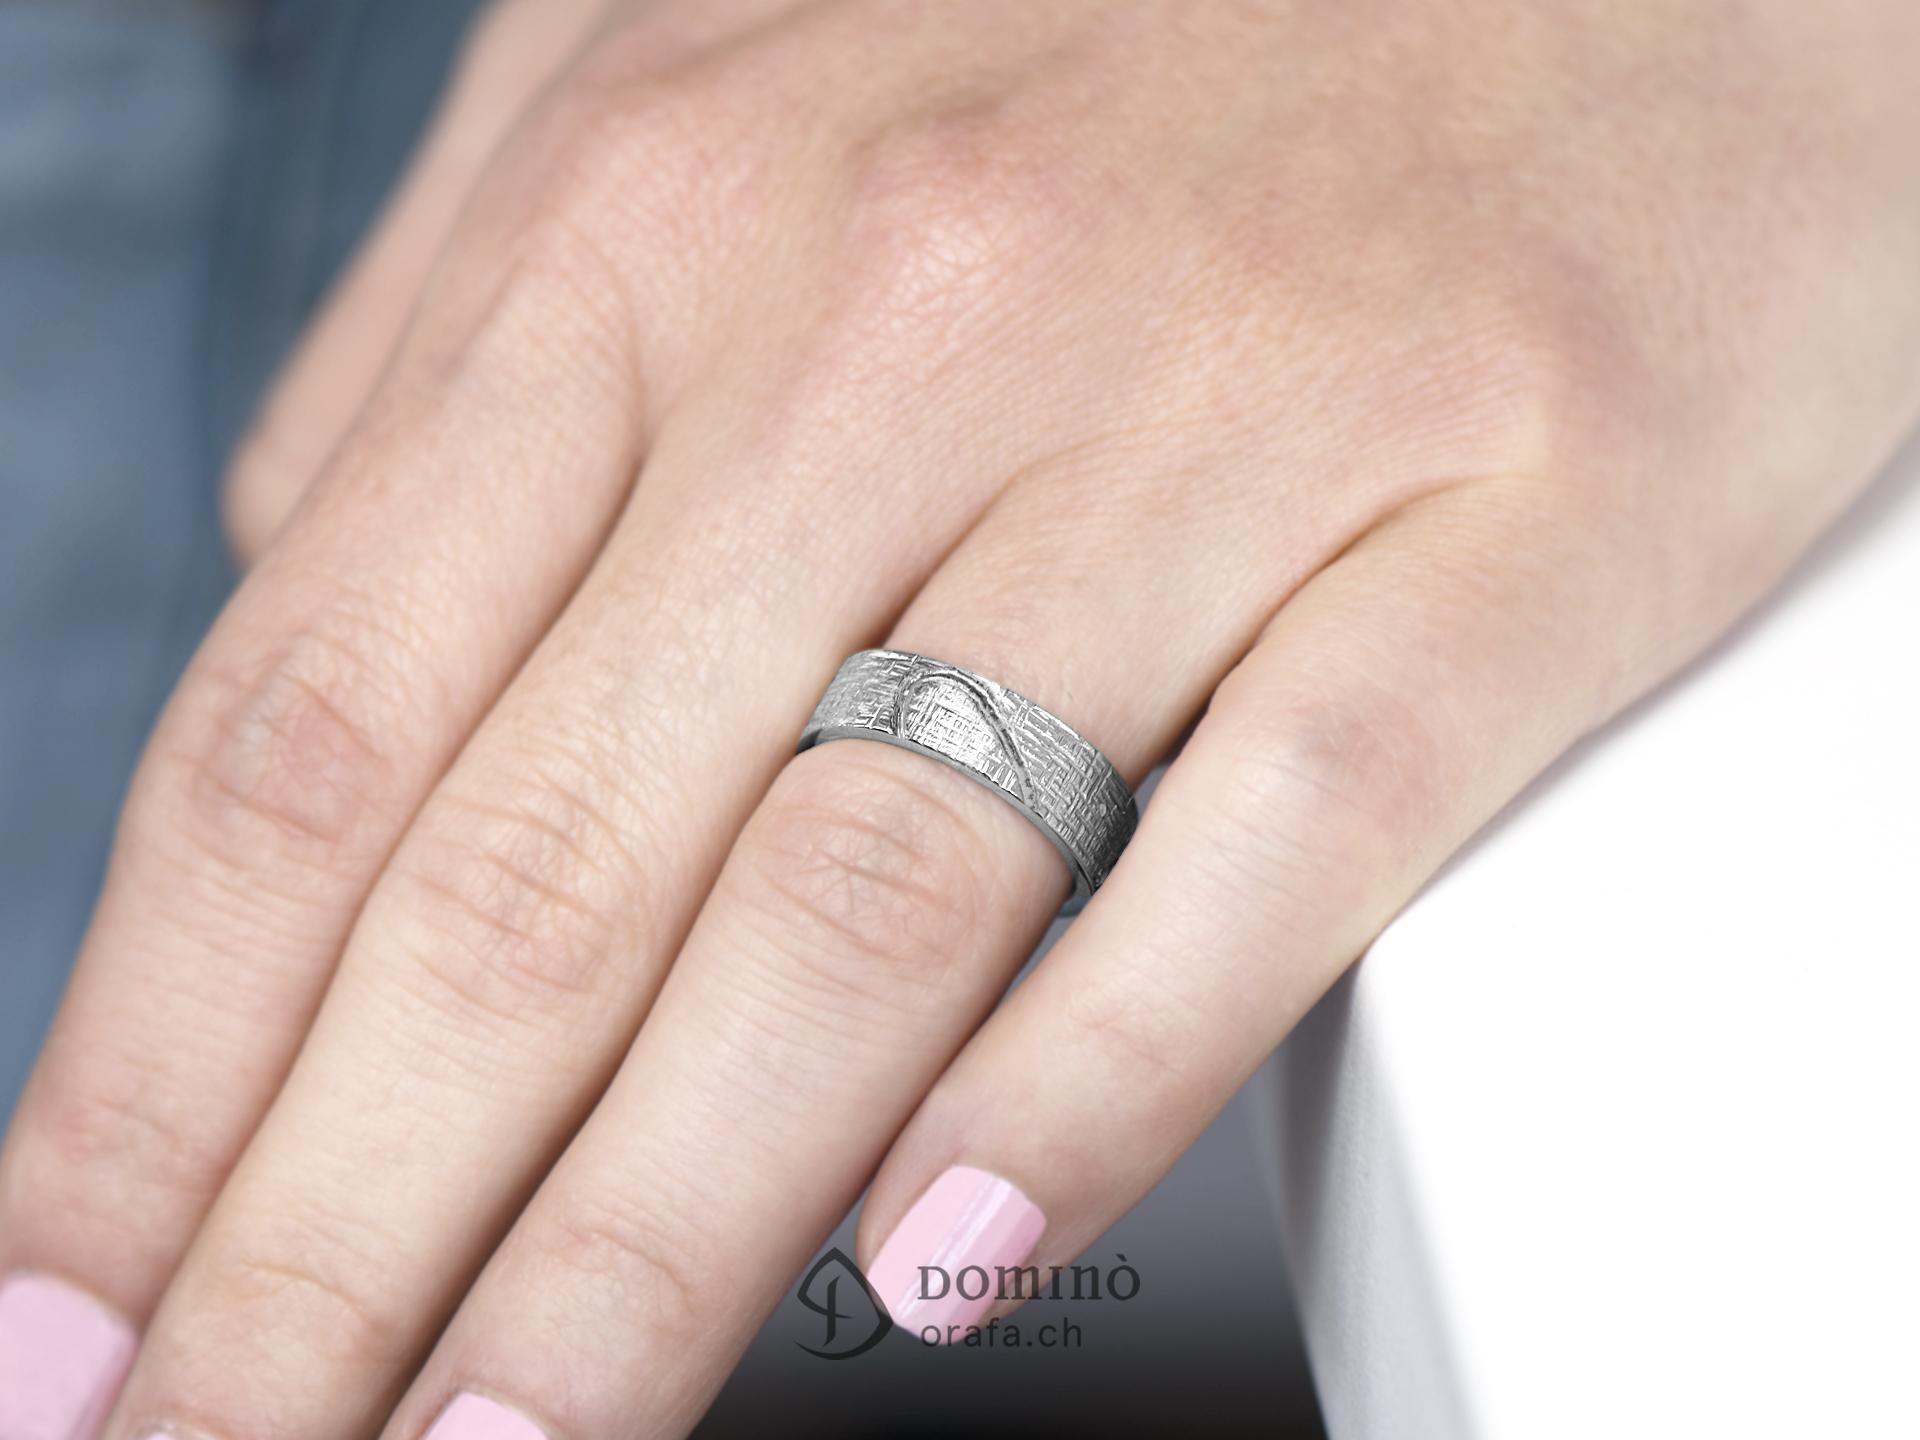 fedi-nuziali-linee-incrociate-cuore-diamanti-inciso-2